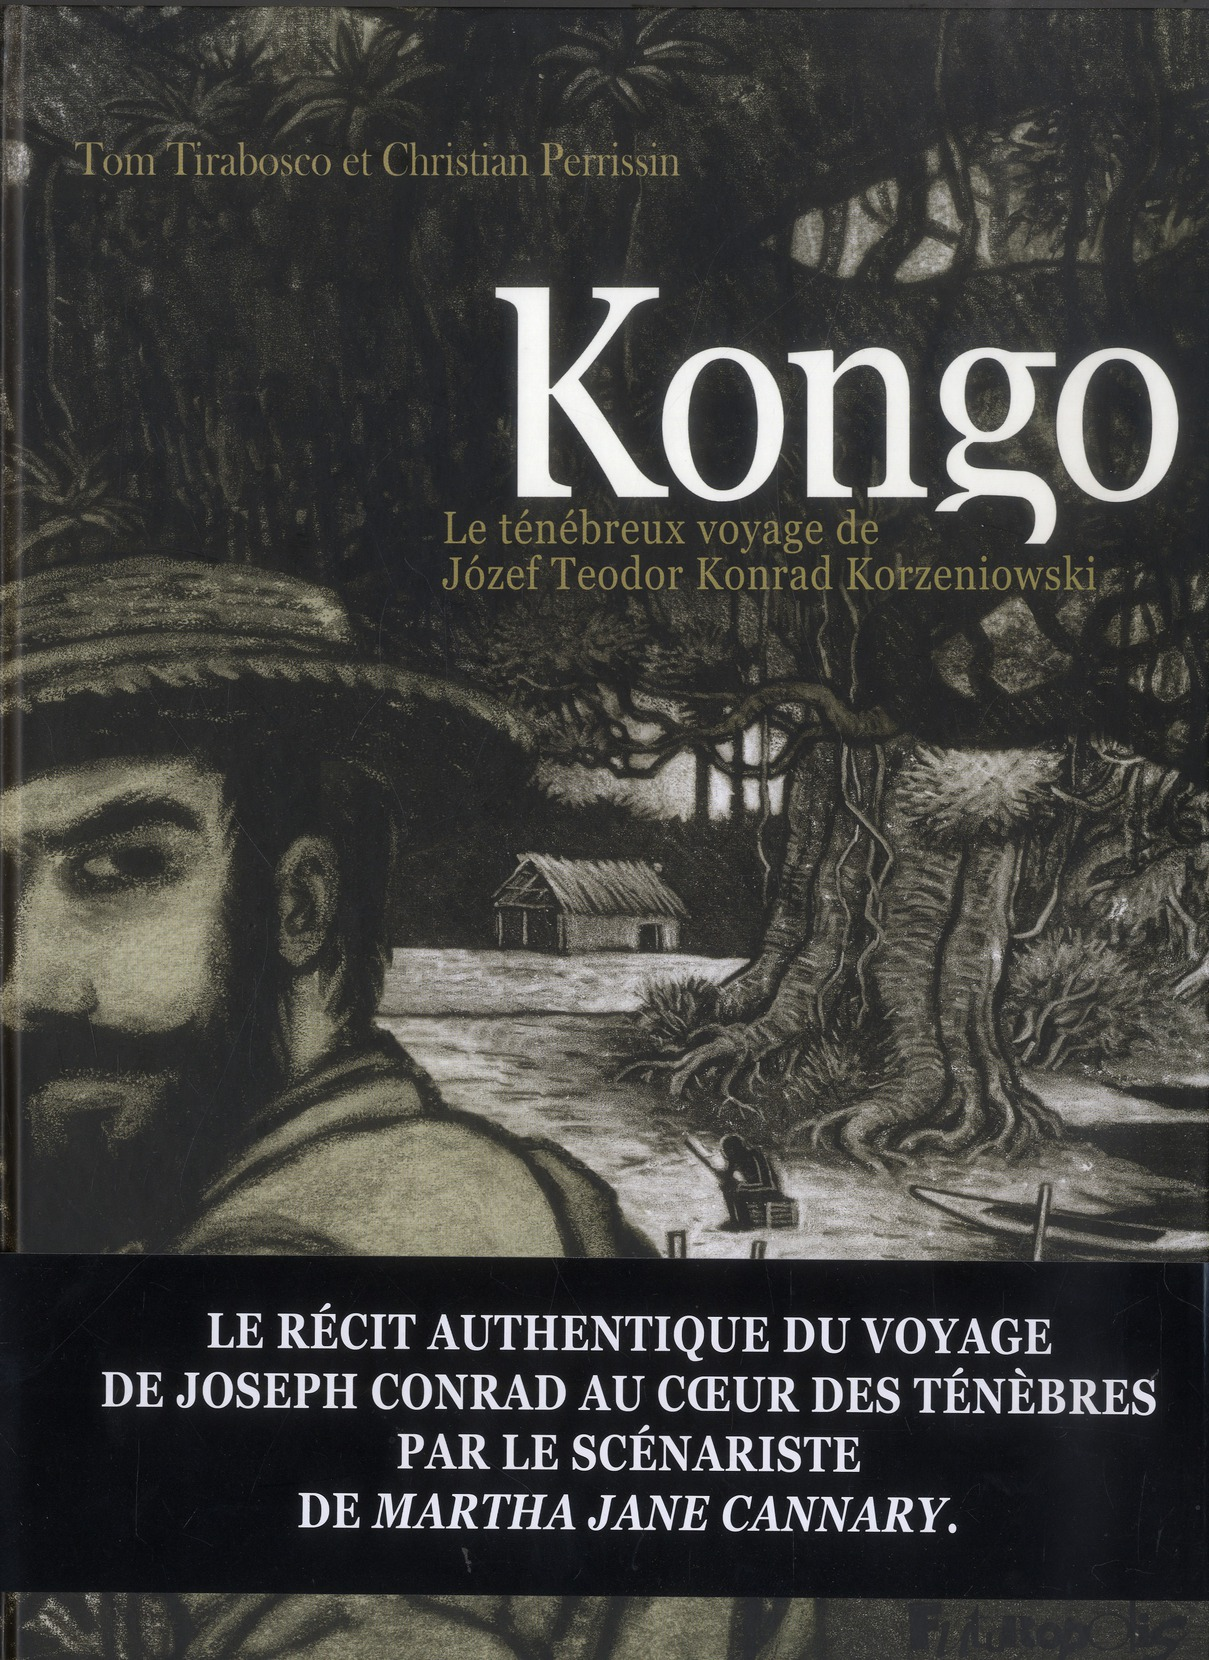 Kongo : Le Tenebreux Voyage De Jozef Teodor Konrad Korzeniowski